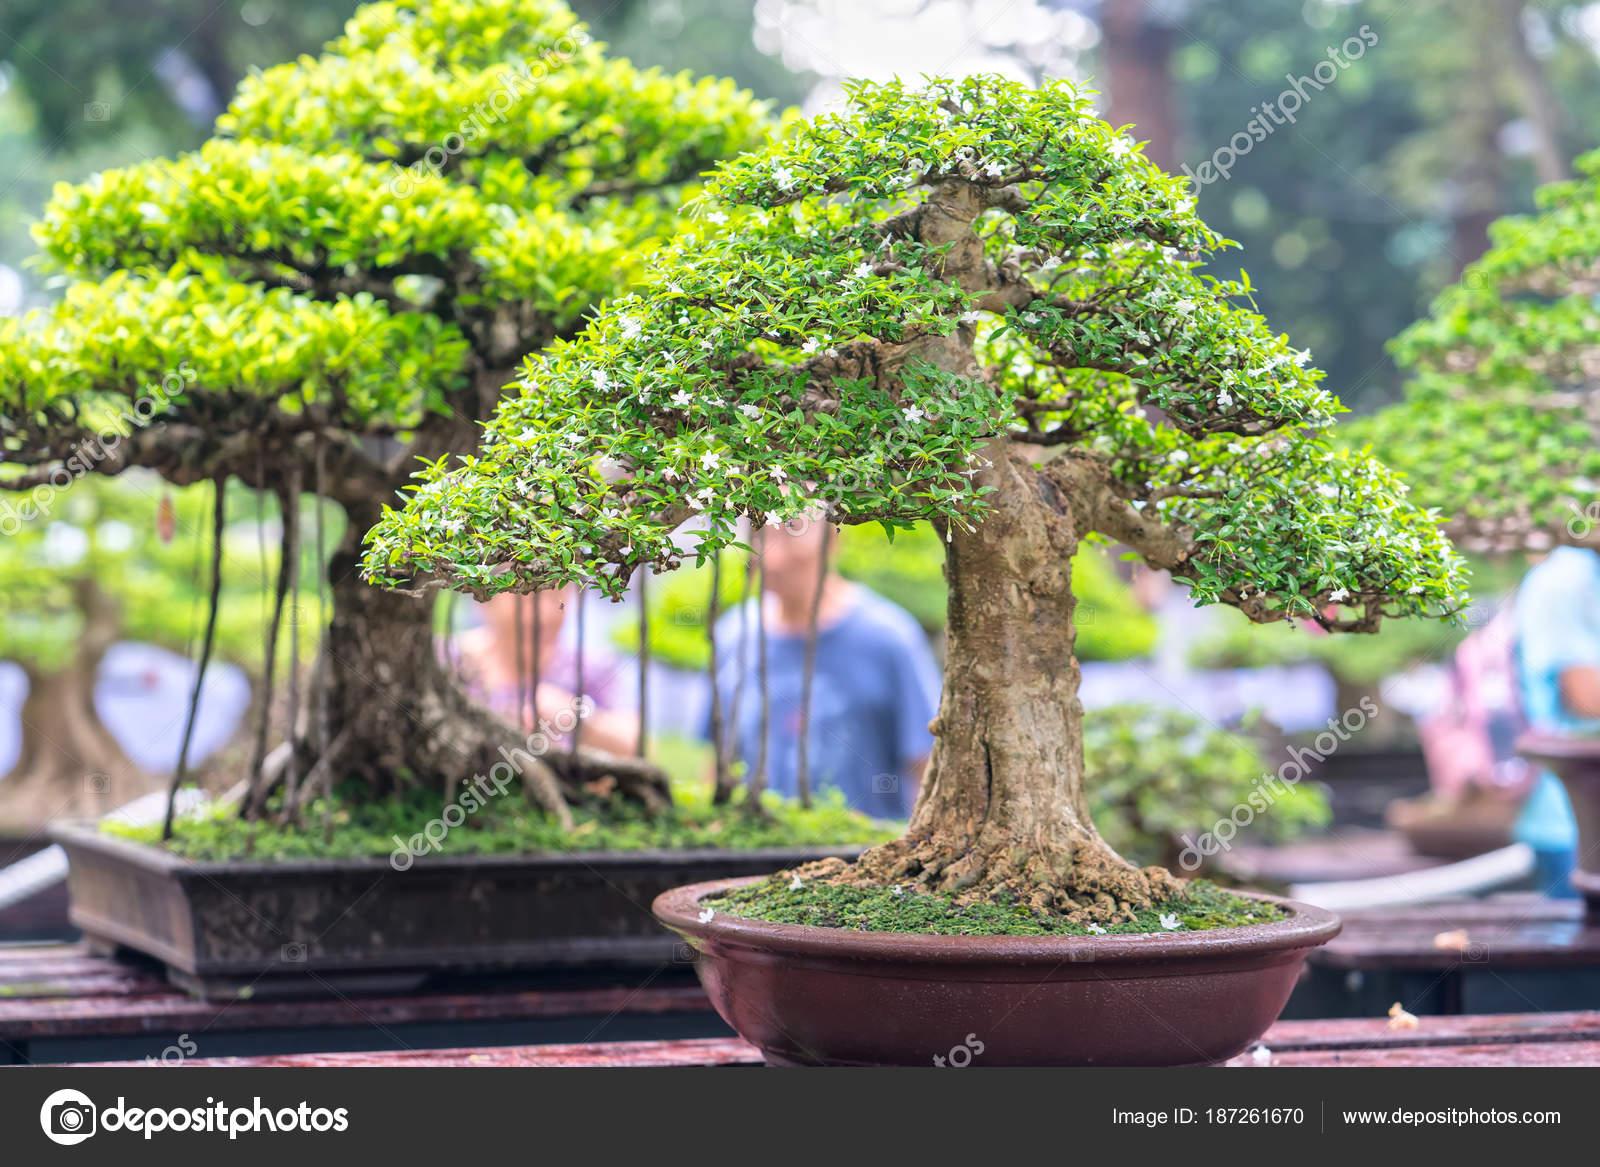 Groene Bonsai Boom Een Pot Lade Plant Vorm Van Stam Stockfoto C Huythoai1978 Gmail Com 187261670